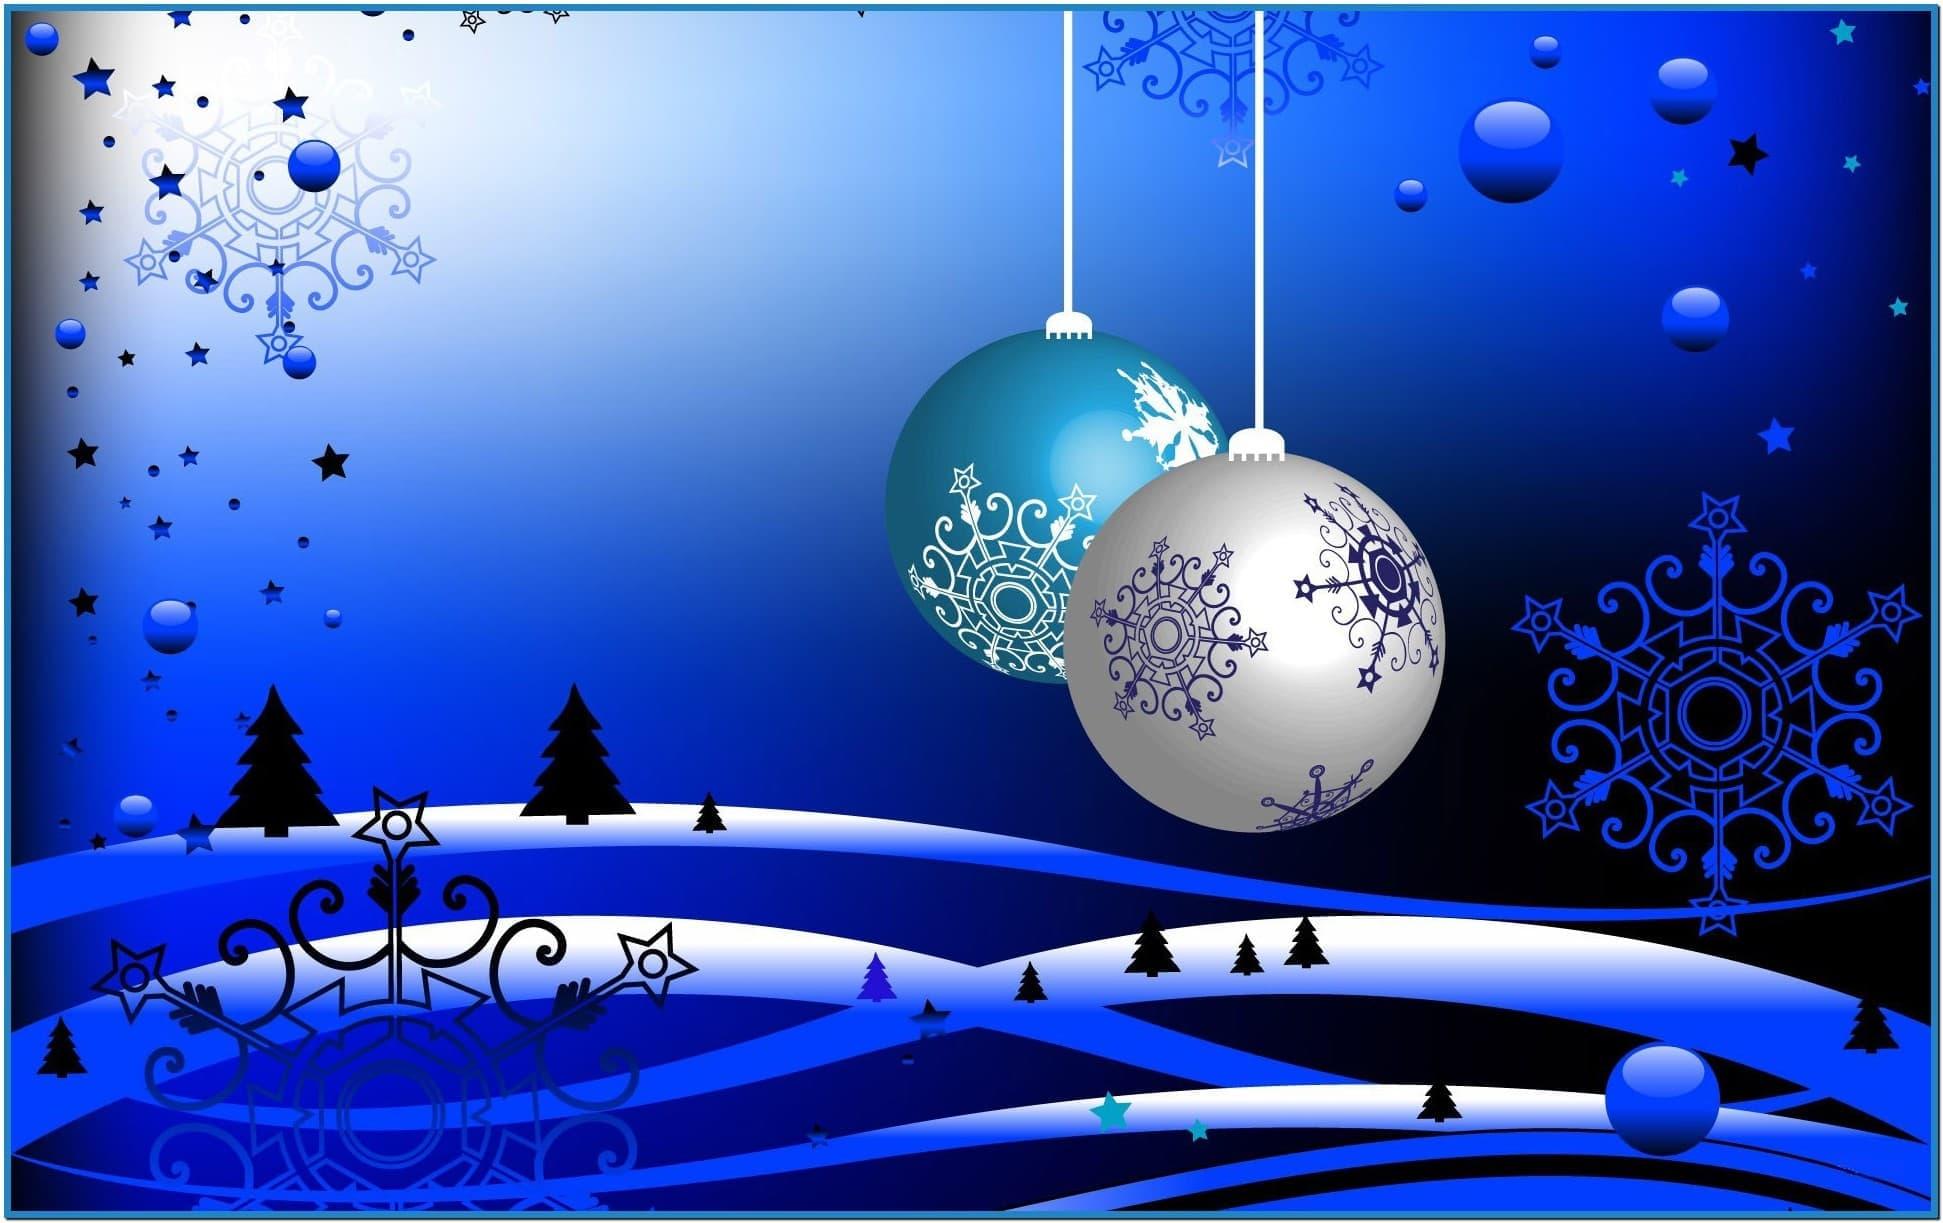 Christmas desktop backgrounds screensavers   Download 1943x1223